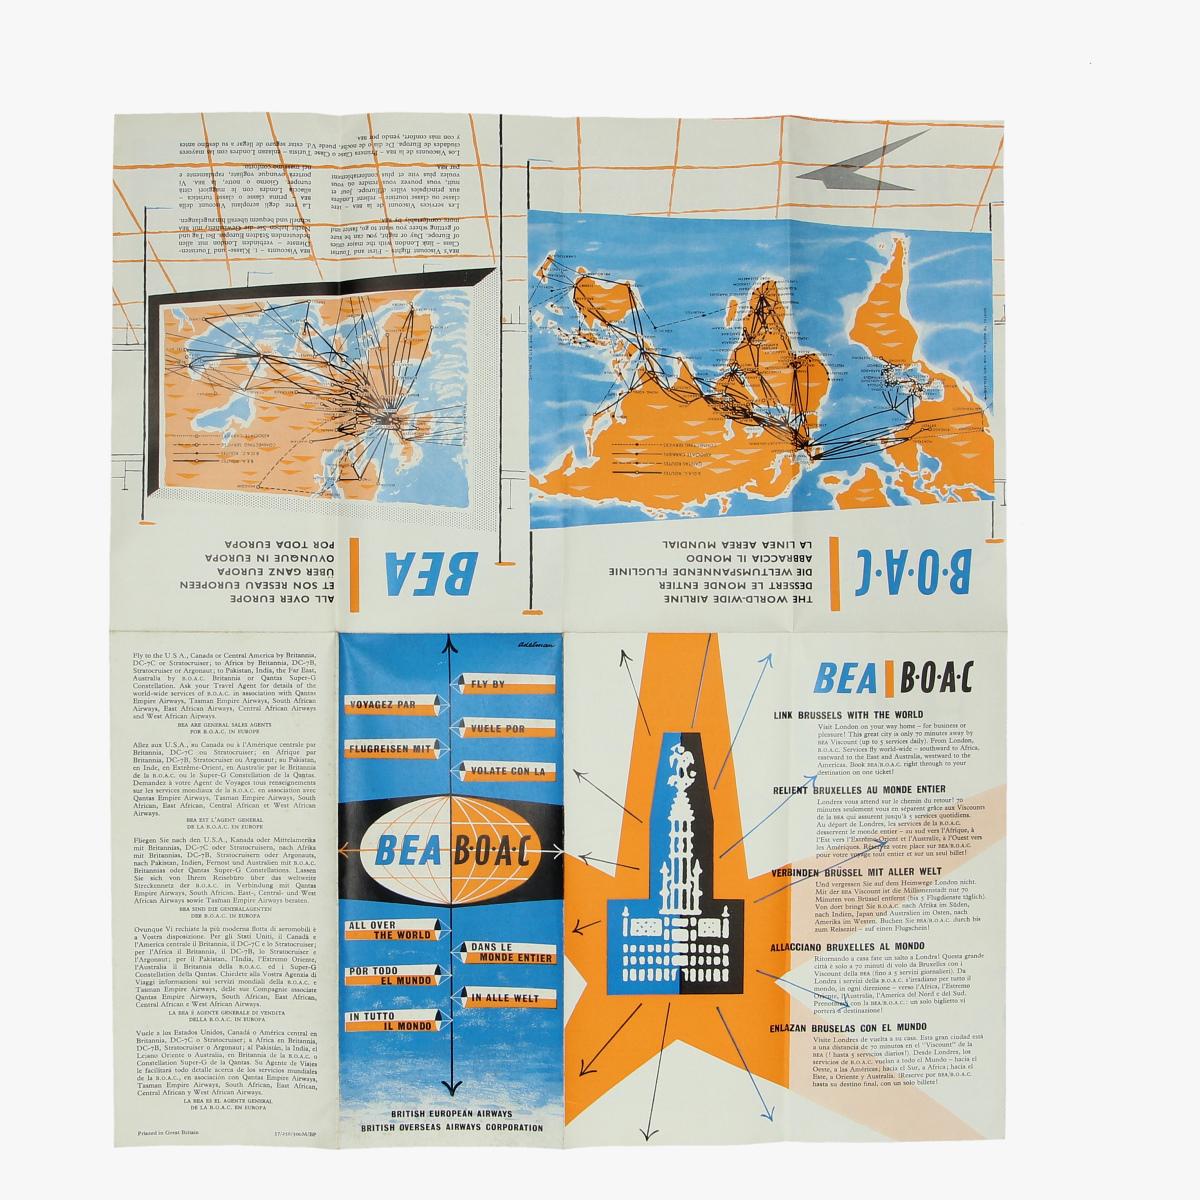 Afbeeldingen van folder british european airways